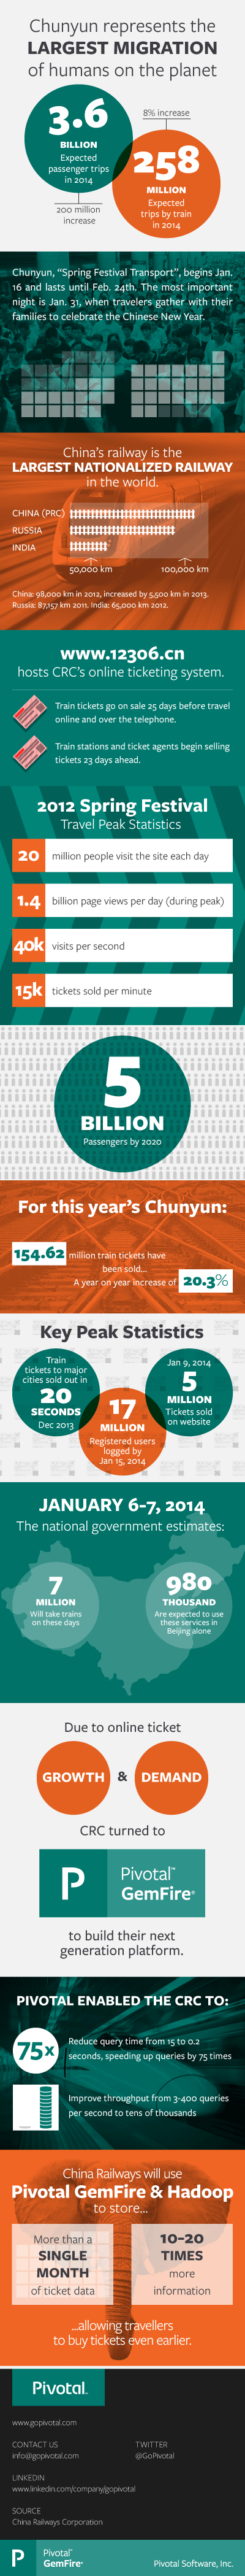 China Railway case study.